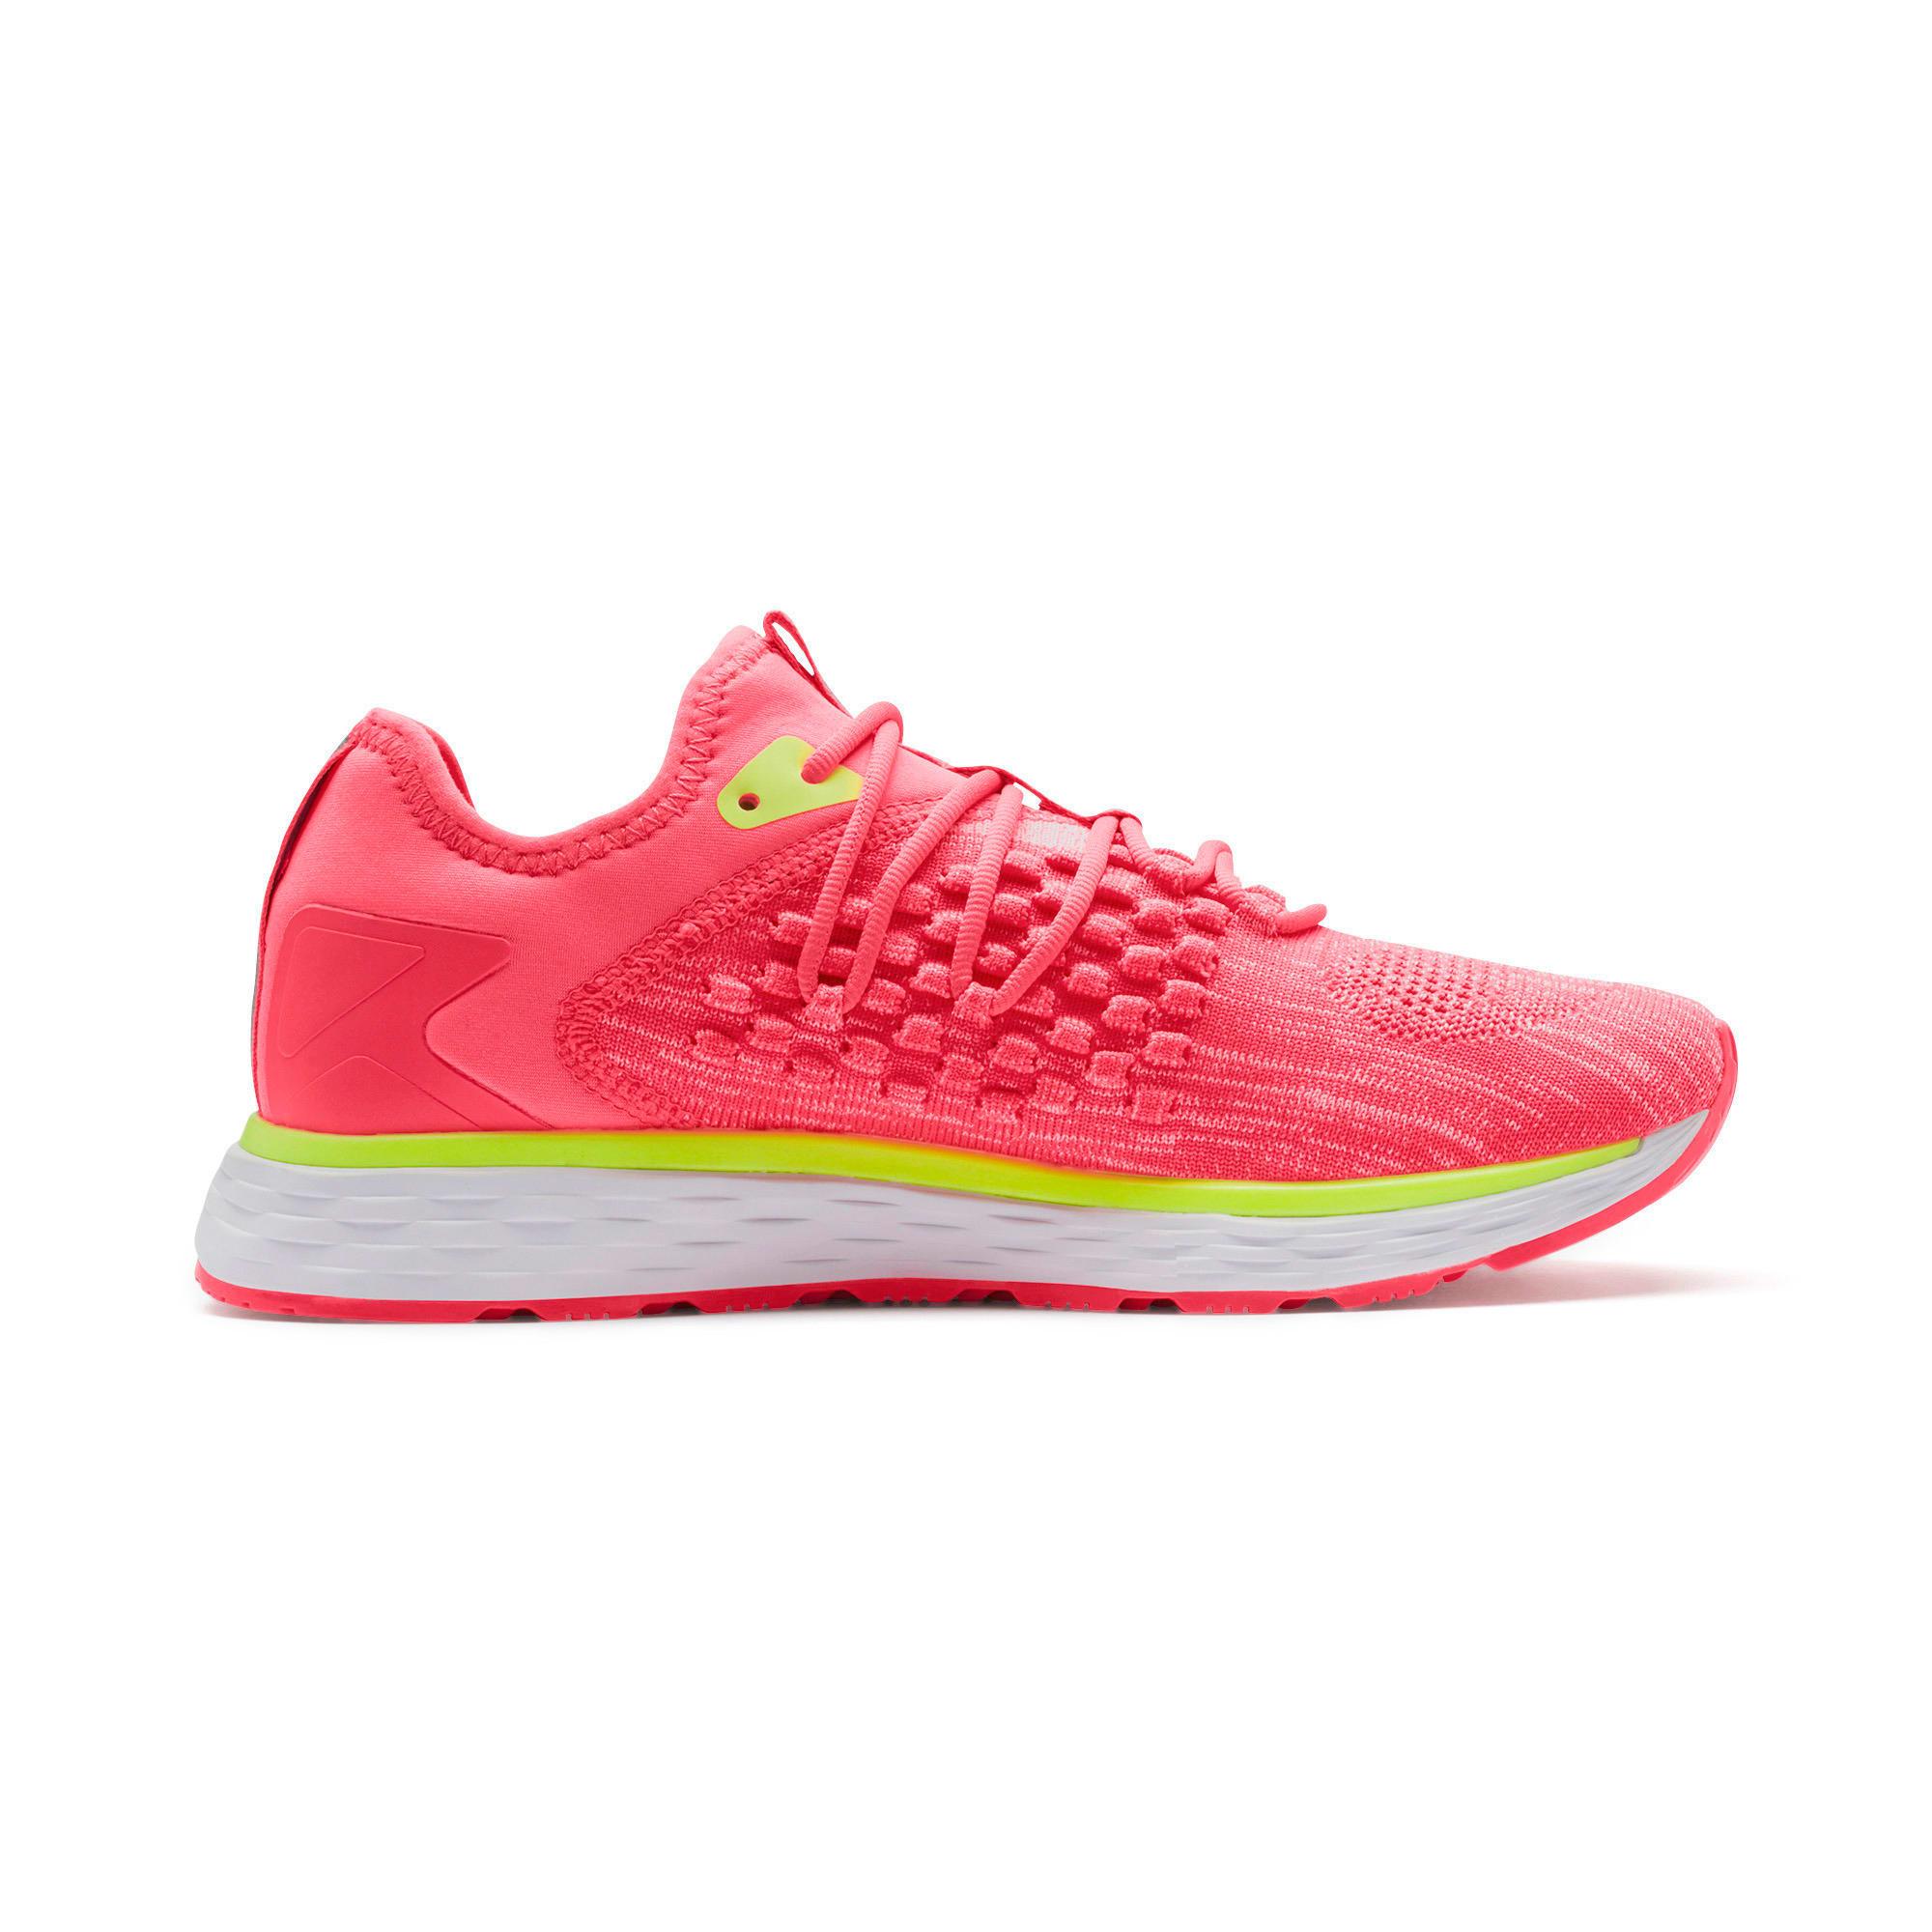 Thumbnail 7 of SPEED FUSEFIT Women's Running Shoes, Pink Alert-Puma White, medium-IND